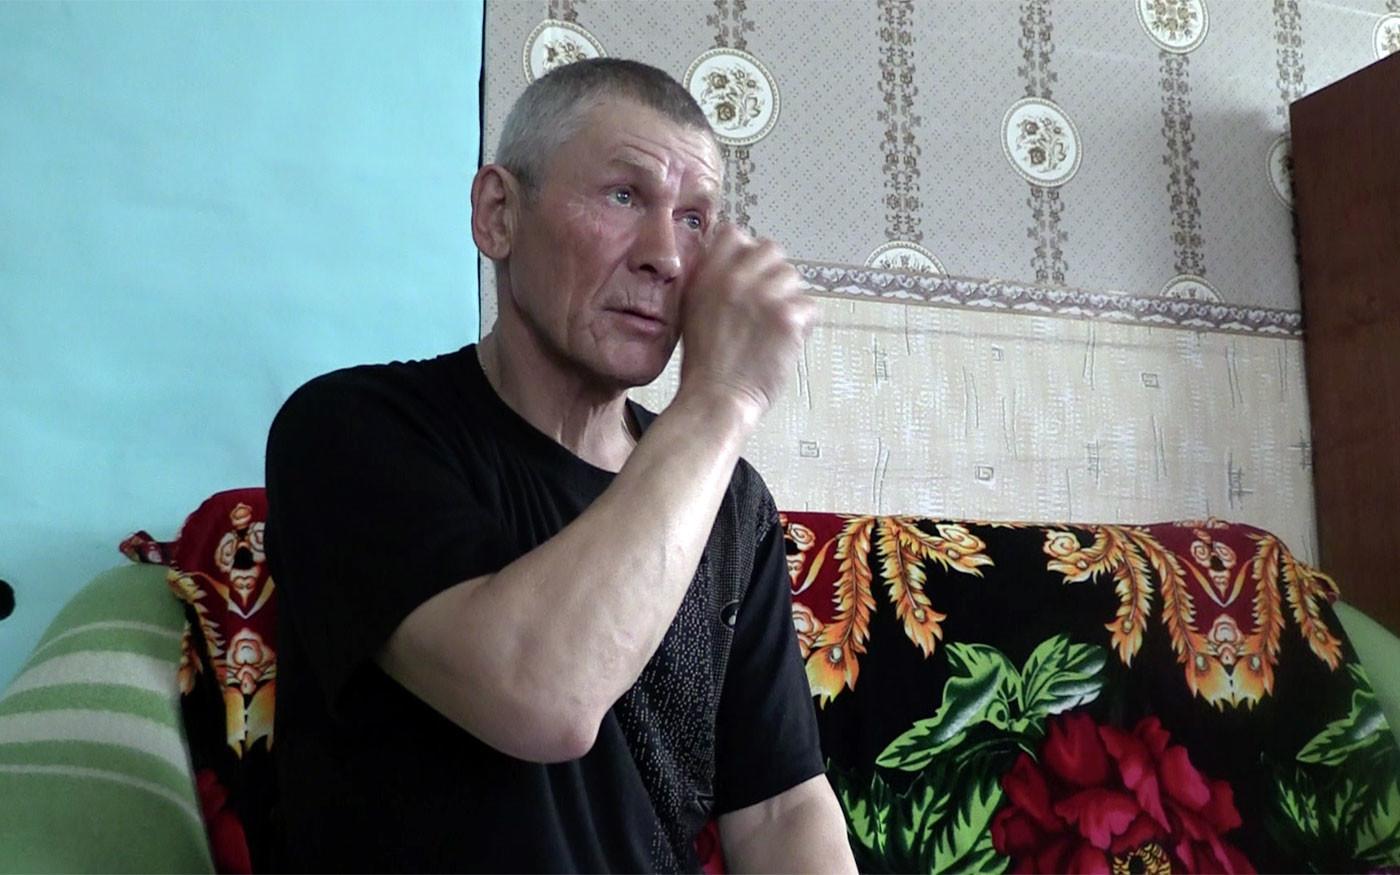 Иван Фёдоров, отец погибшей. Фото: © L!FE